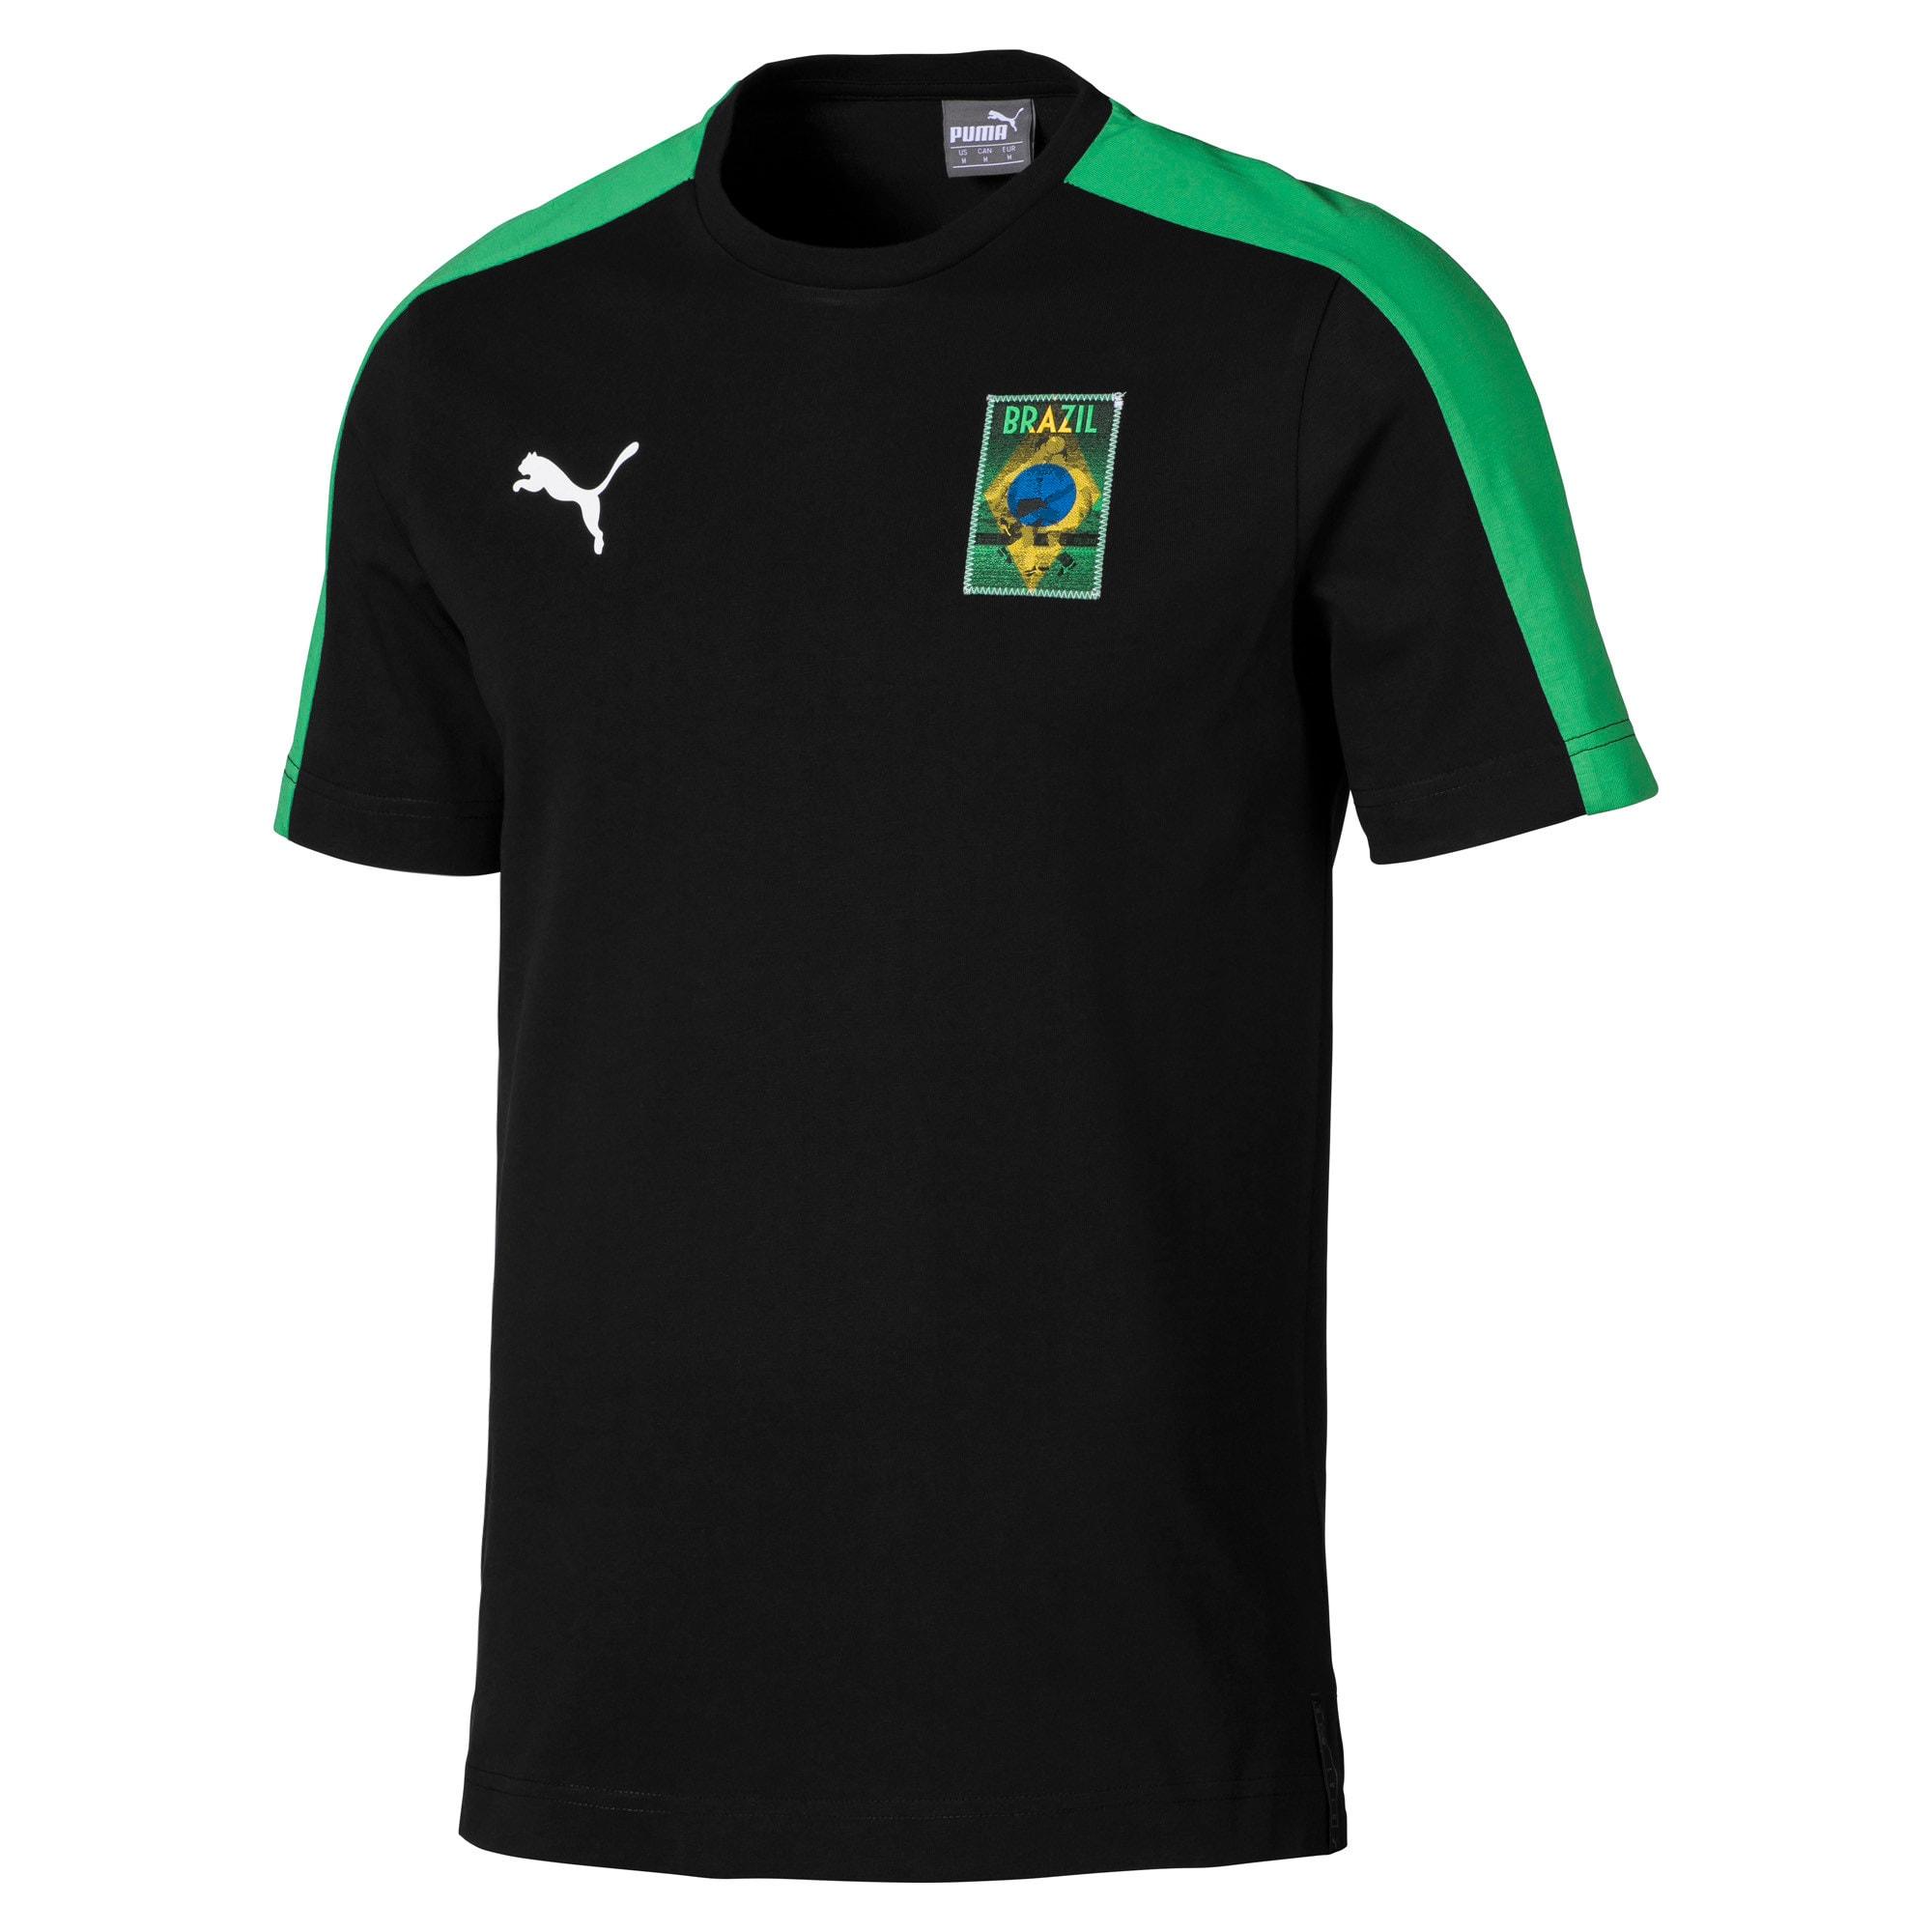 Thumbnail 3 of Copa America Men's T7 Tee, Puma Black-Brazil, medium